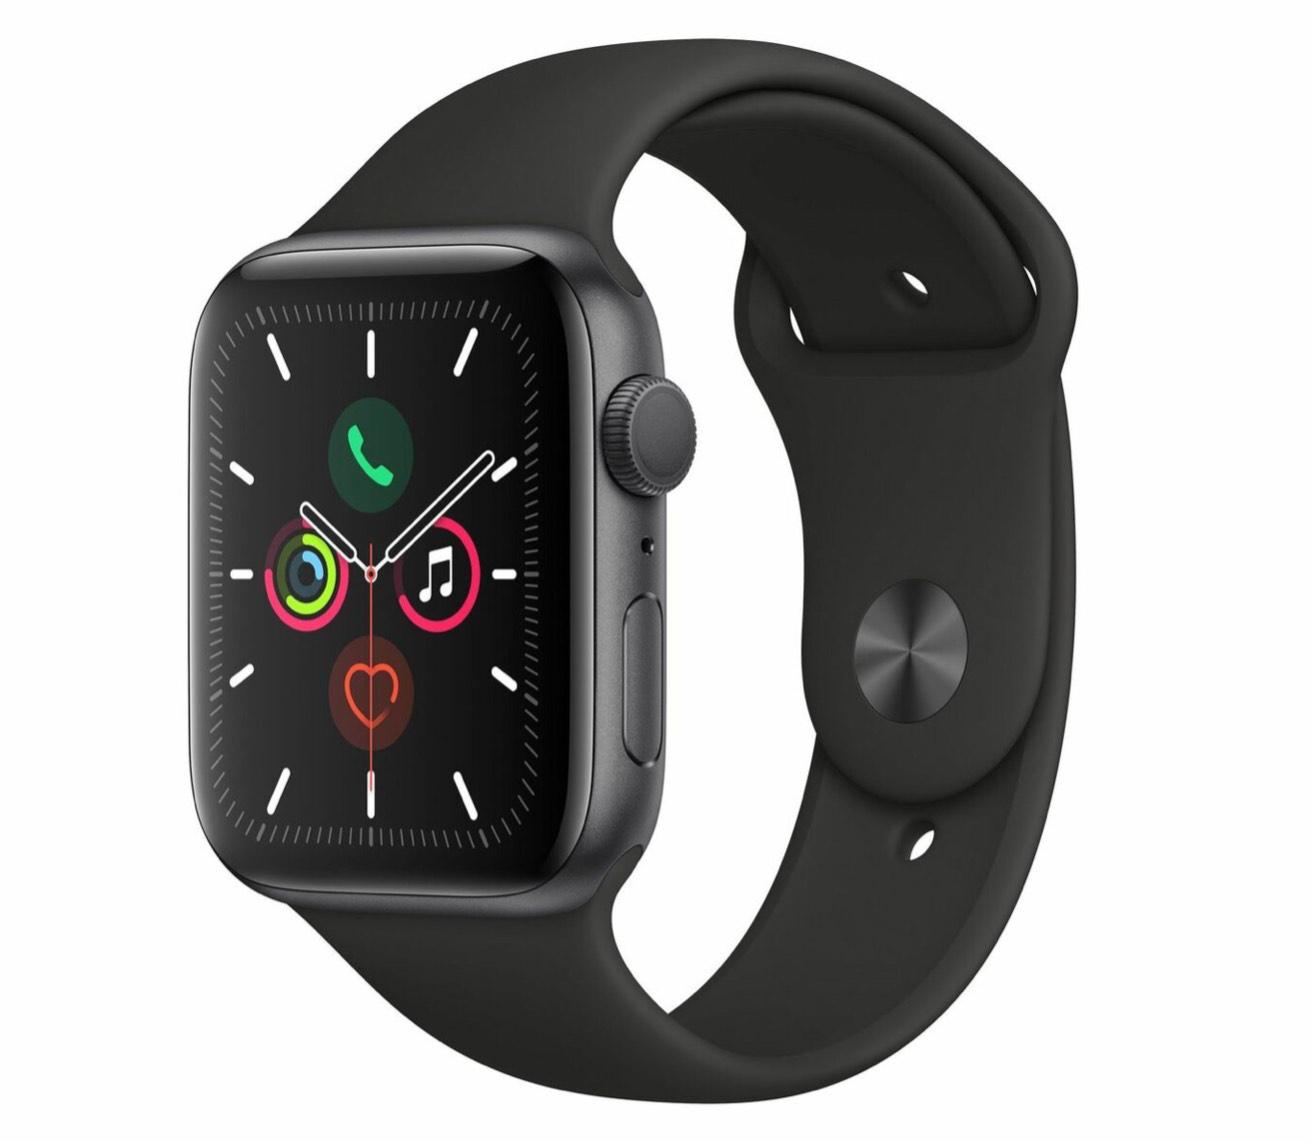 Apple Watch Series 5, 44mm, Aluminiumgehäuse spacegrau, Sportarmband schwarz